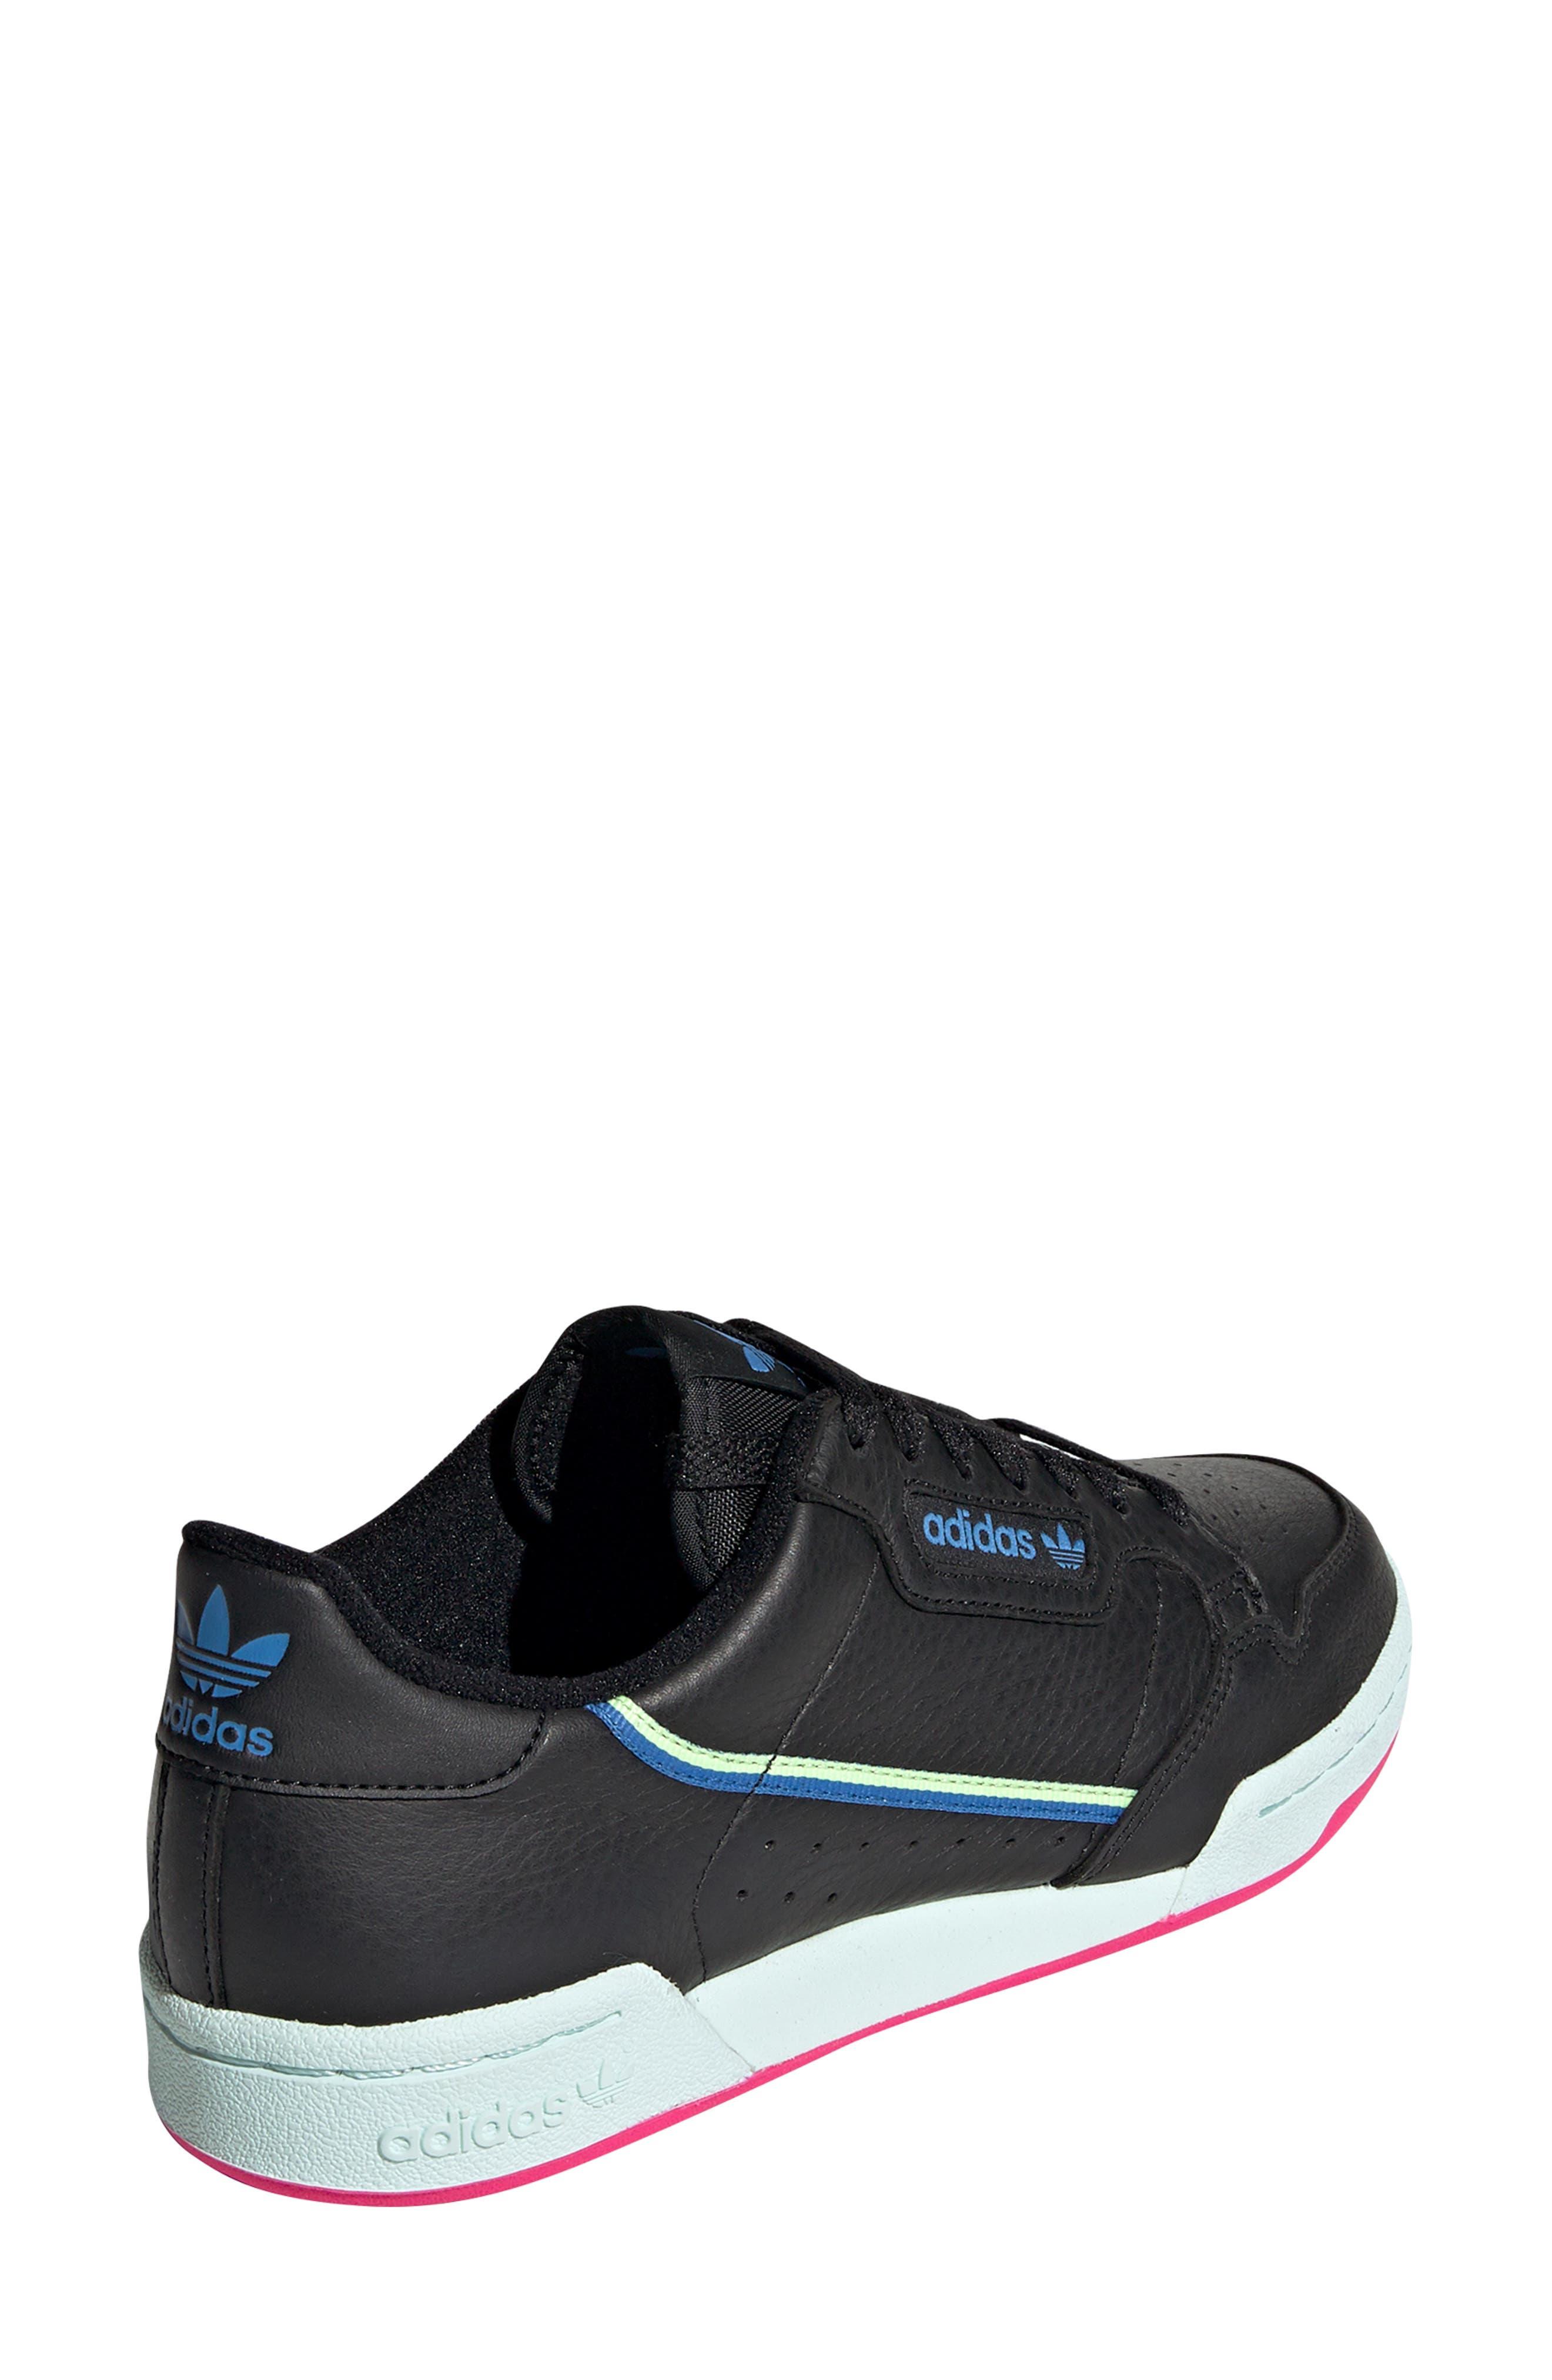 ADIDAS,                             Continental 80 Sneaker,                             Alternate thumbnail 2, color,                             BLACK/ HI-RES YELLOW/ BLUE